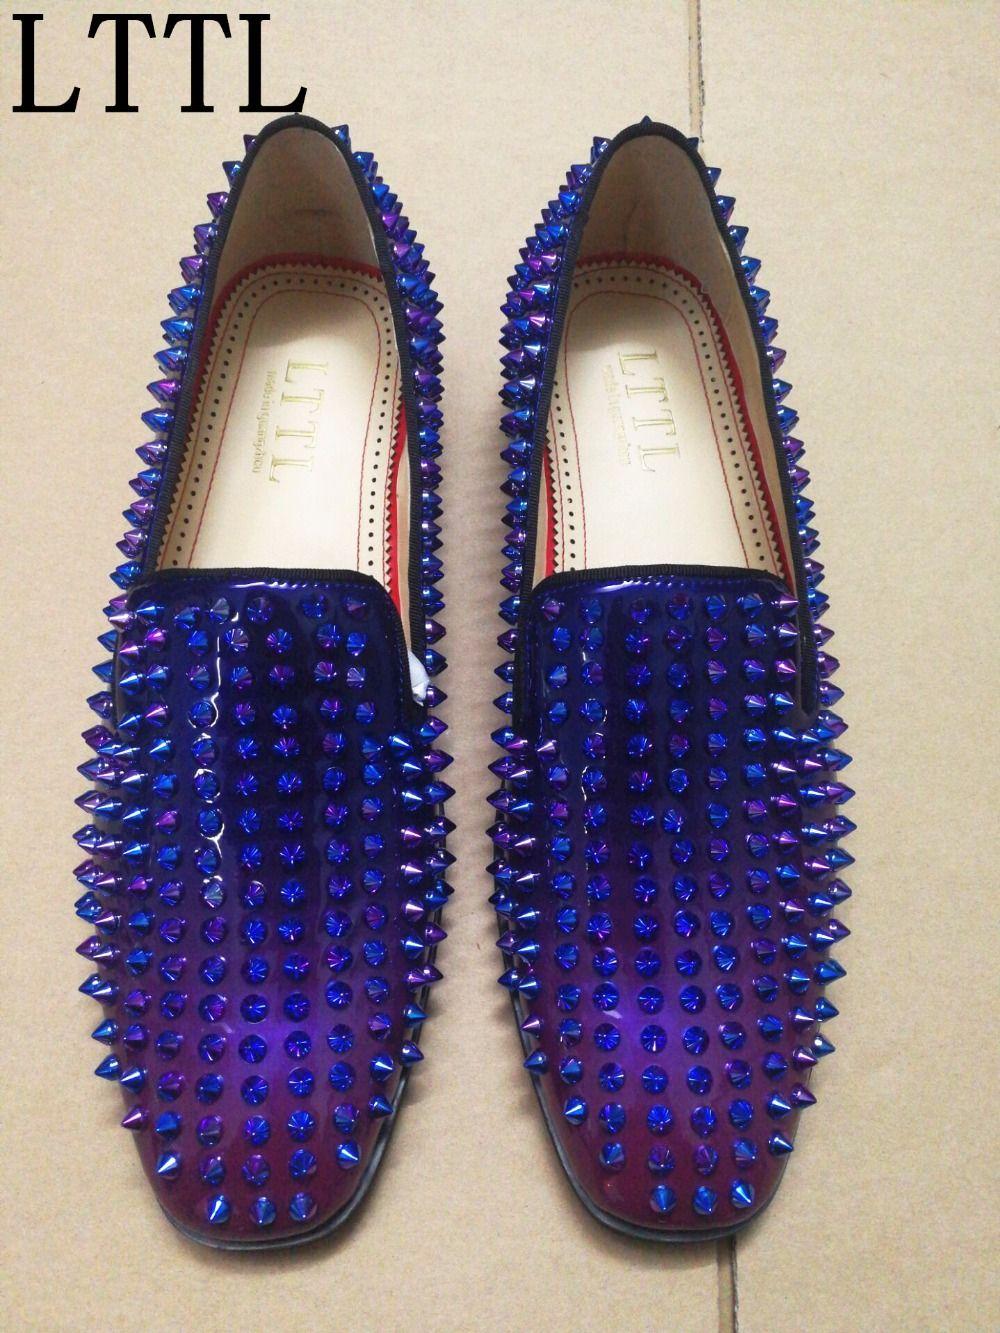 39a400208db2 Mens Designer LTTL Spike Shoes Spring Summer Colorful Rivets Loafers Rubber  Soles Slip-on Flats